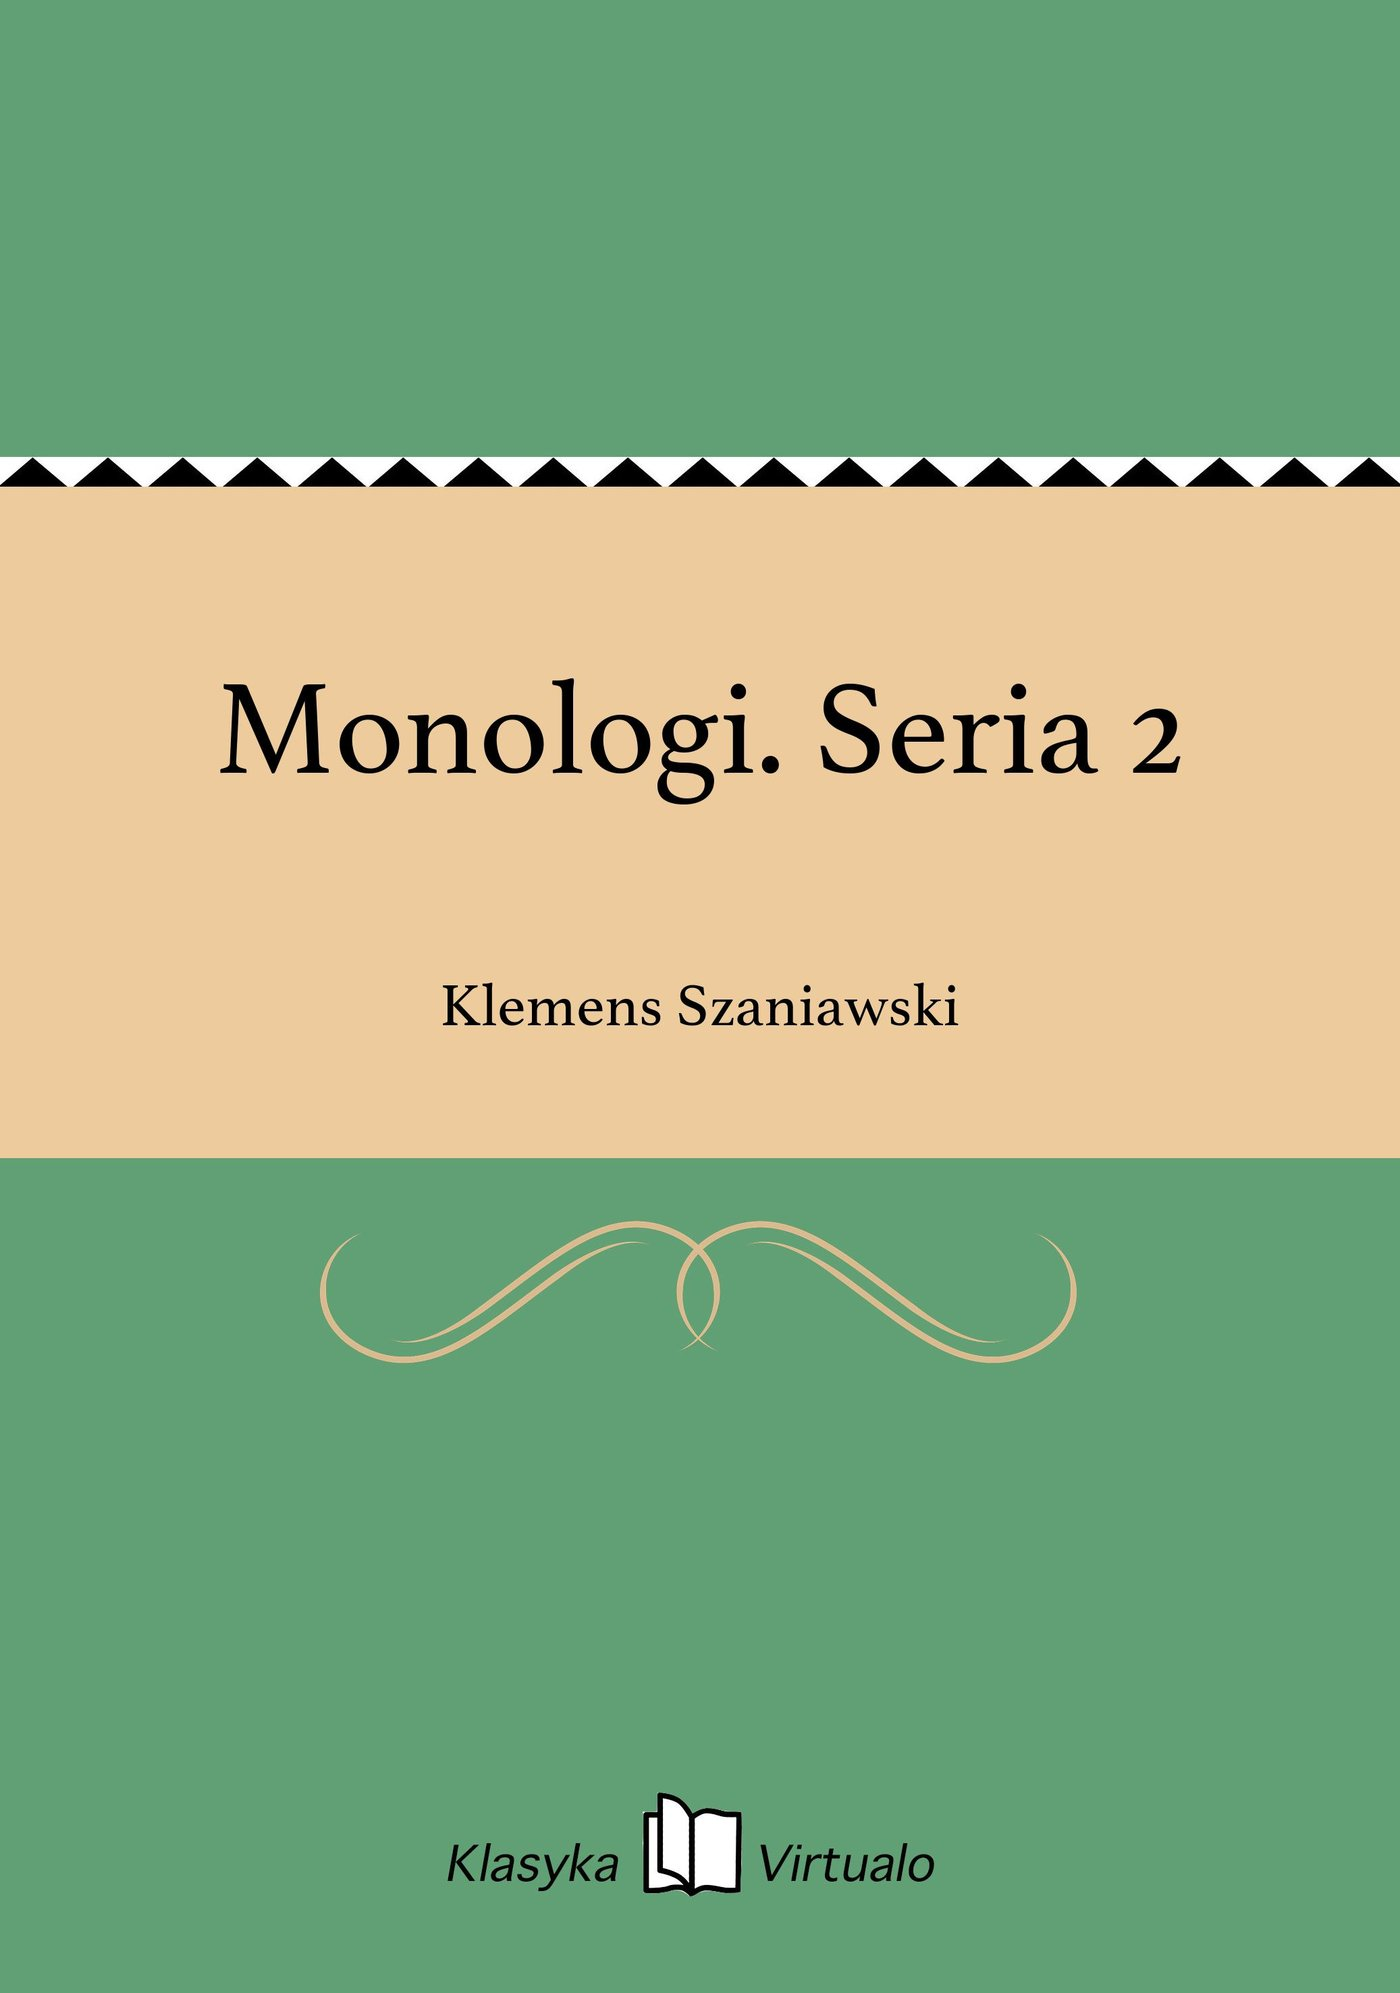 Monologi. Seria 2 - Ebook (Książka EPUB) do pobrania w formacie EPUB